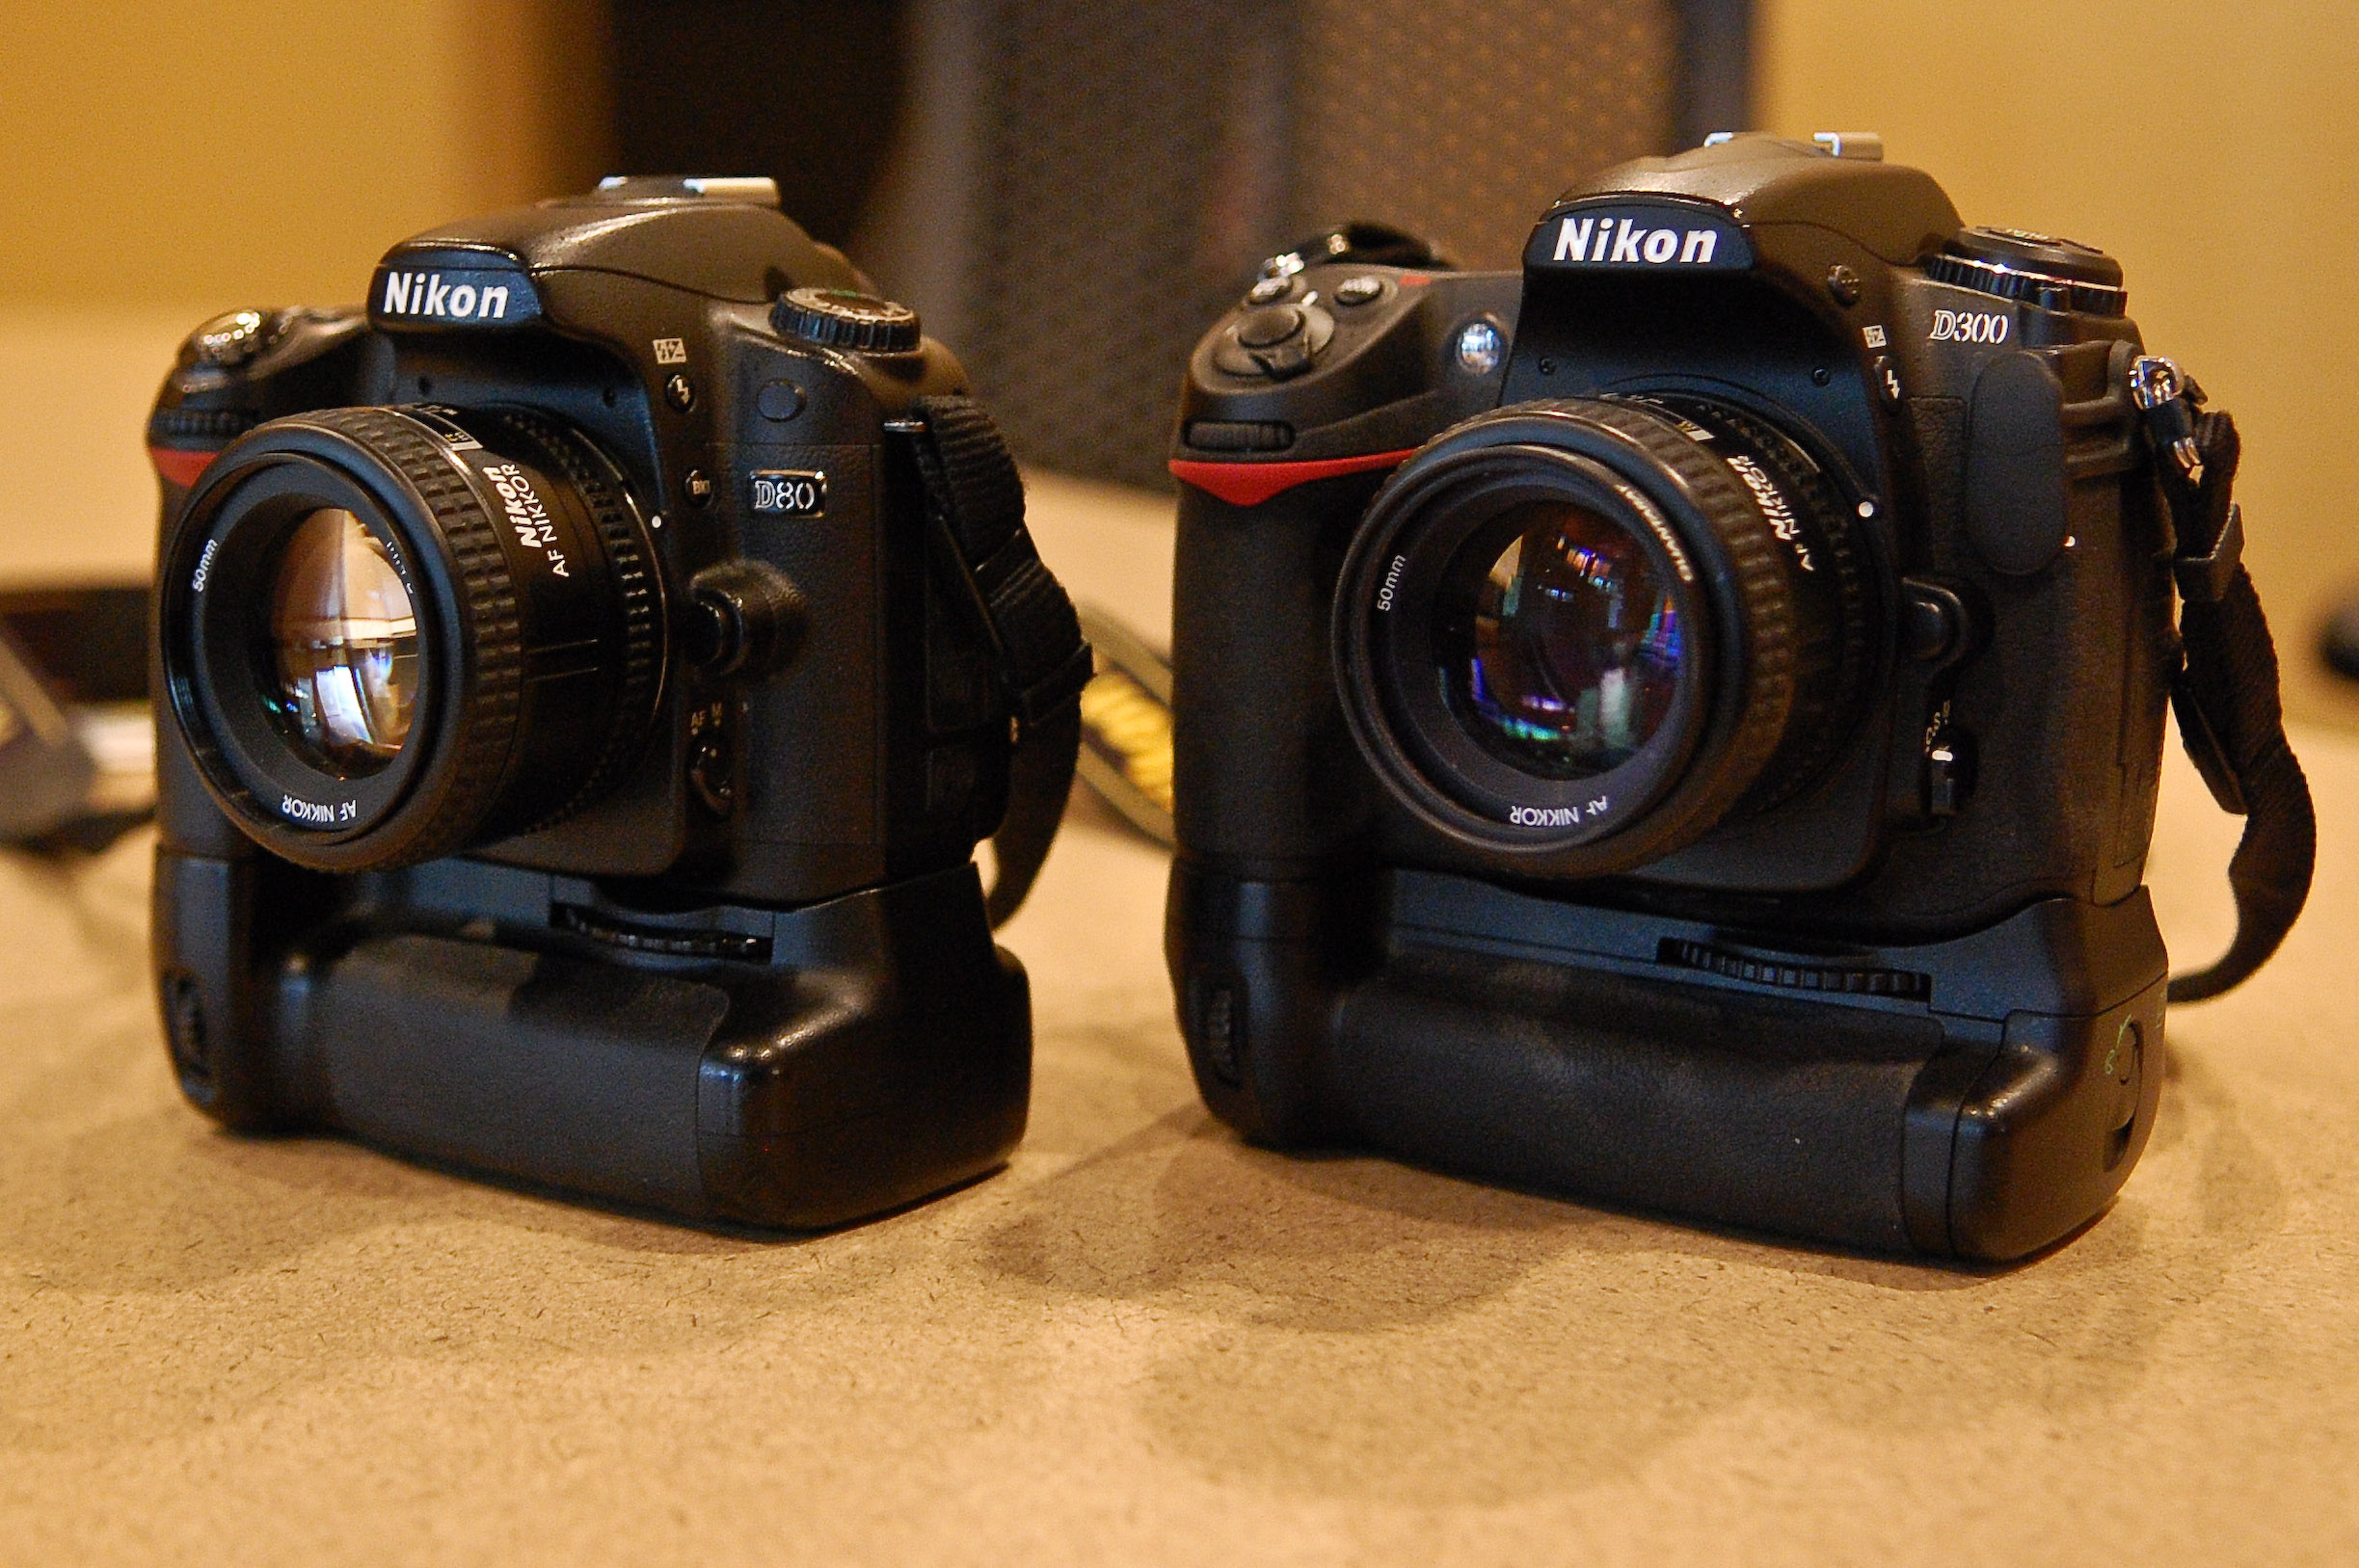 File:Nikon D80 and D300.jpg - Wikimedia Commons